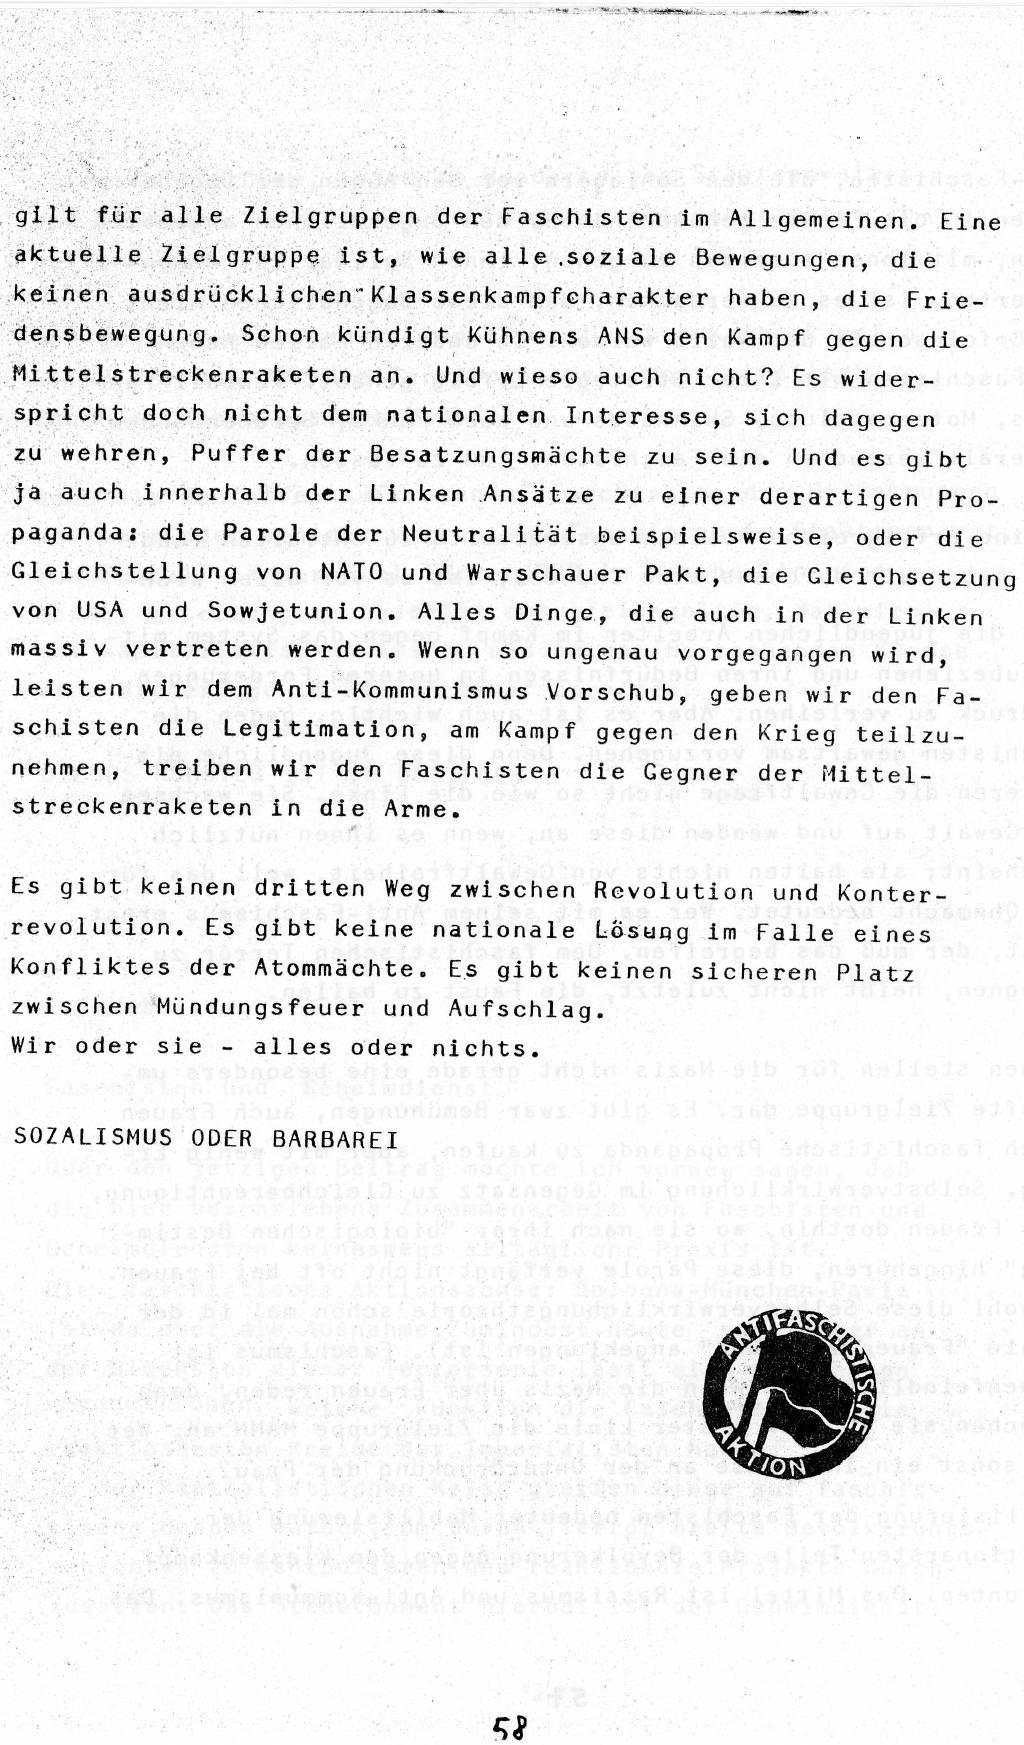 Berlin_1983_Autonome_Gruppen_Faschismus_im_Kapitalismus_58